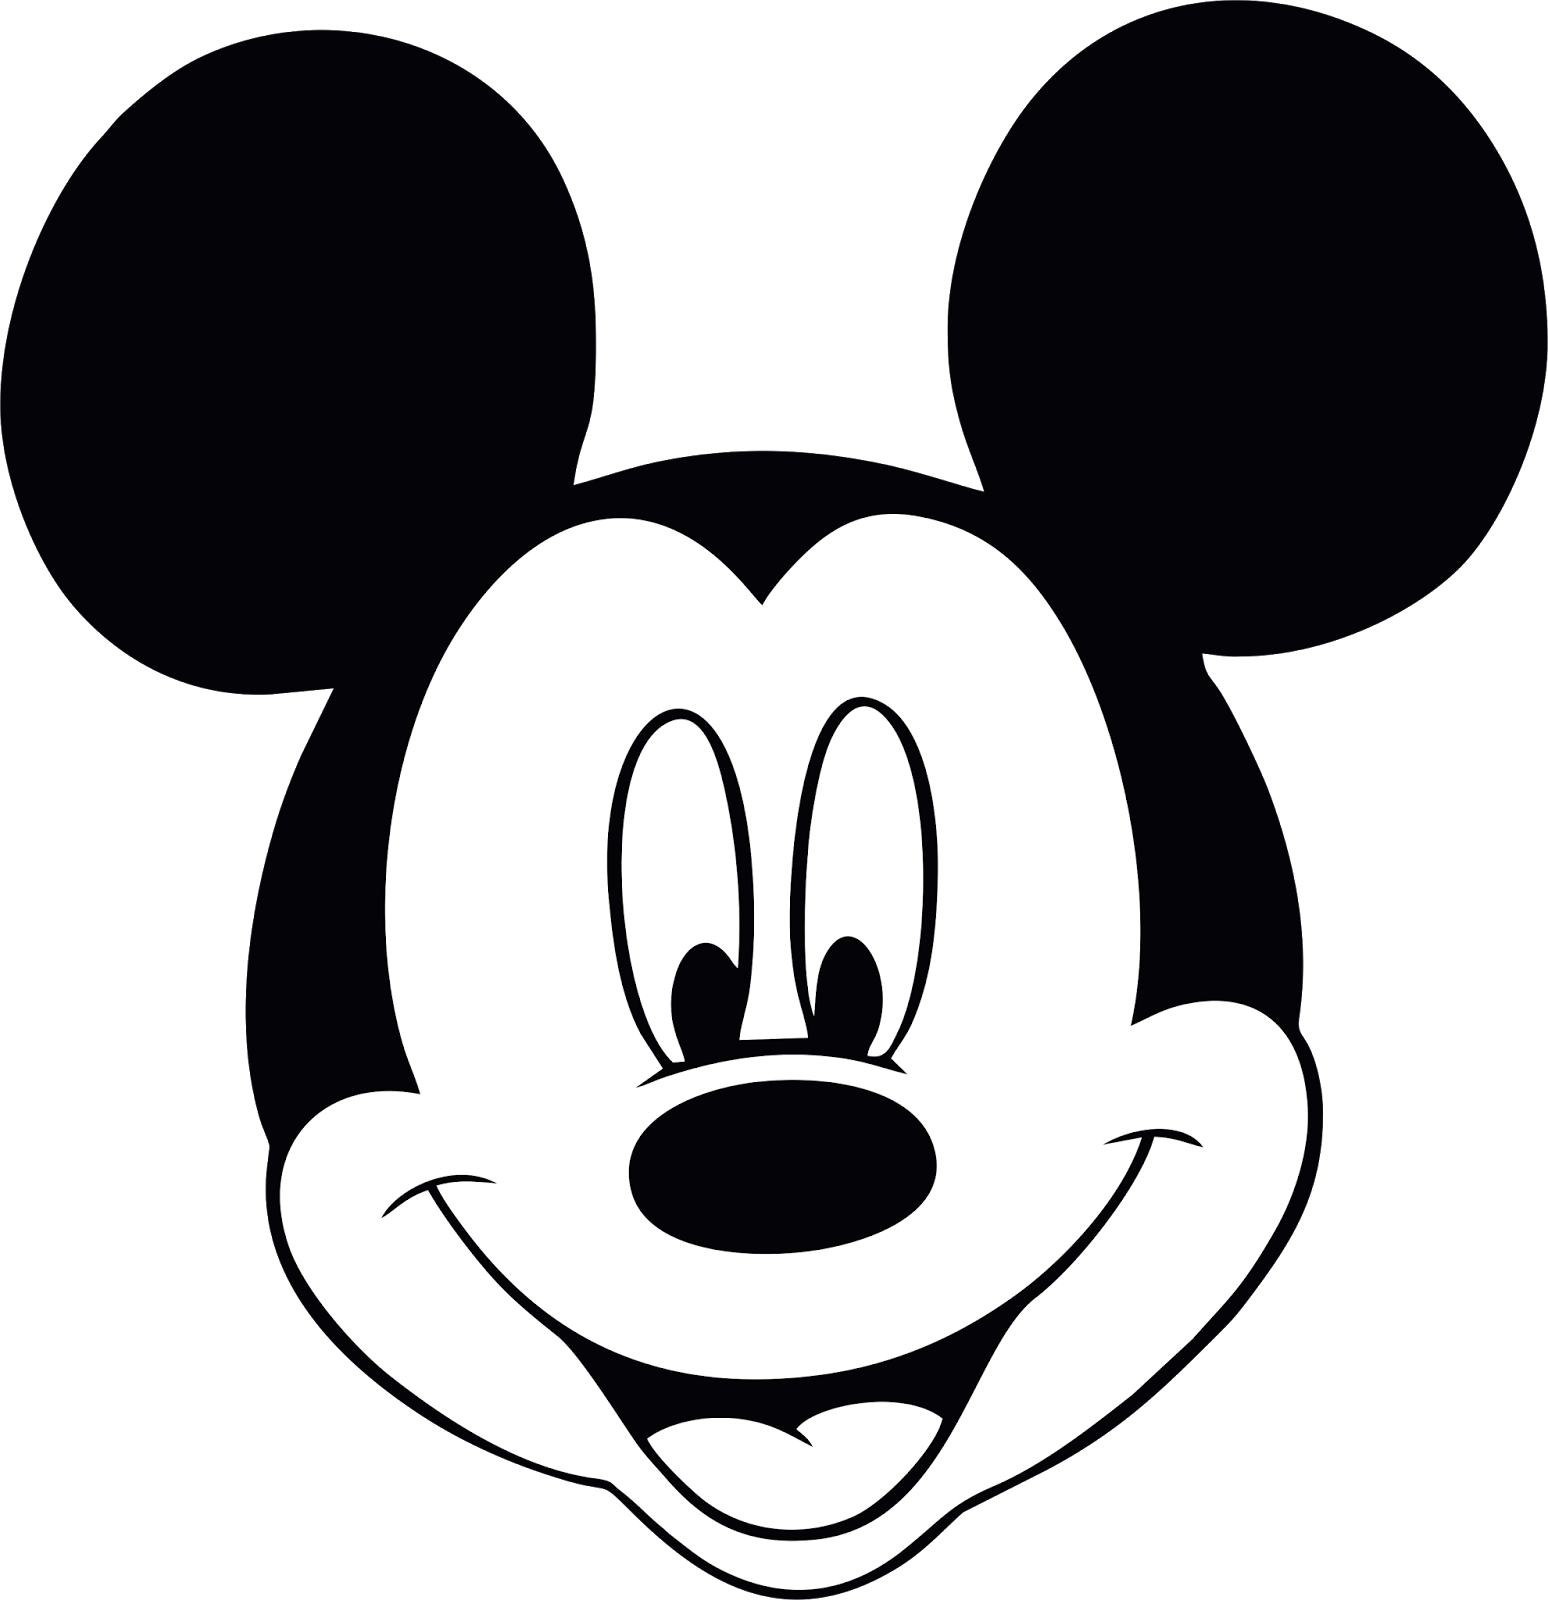 mickey mouse imagens vetorizadas gr tis